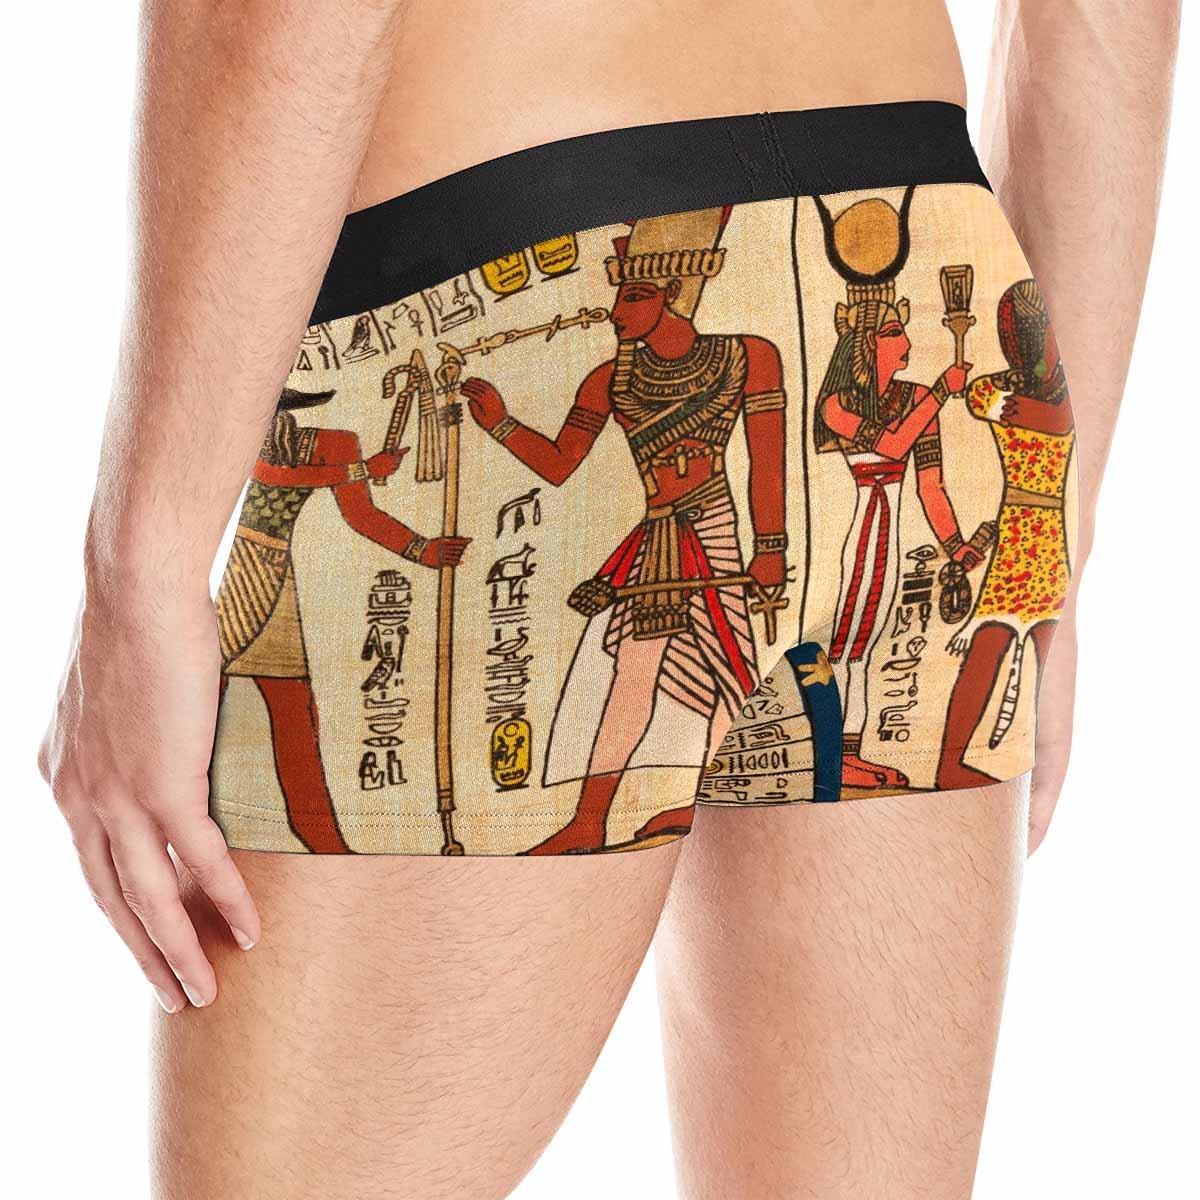 XS-3XL INTERESTPRINT Boxer Briefs Mens Underwear Egyptian Papyrus with Antique Hieroglyphs